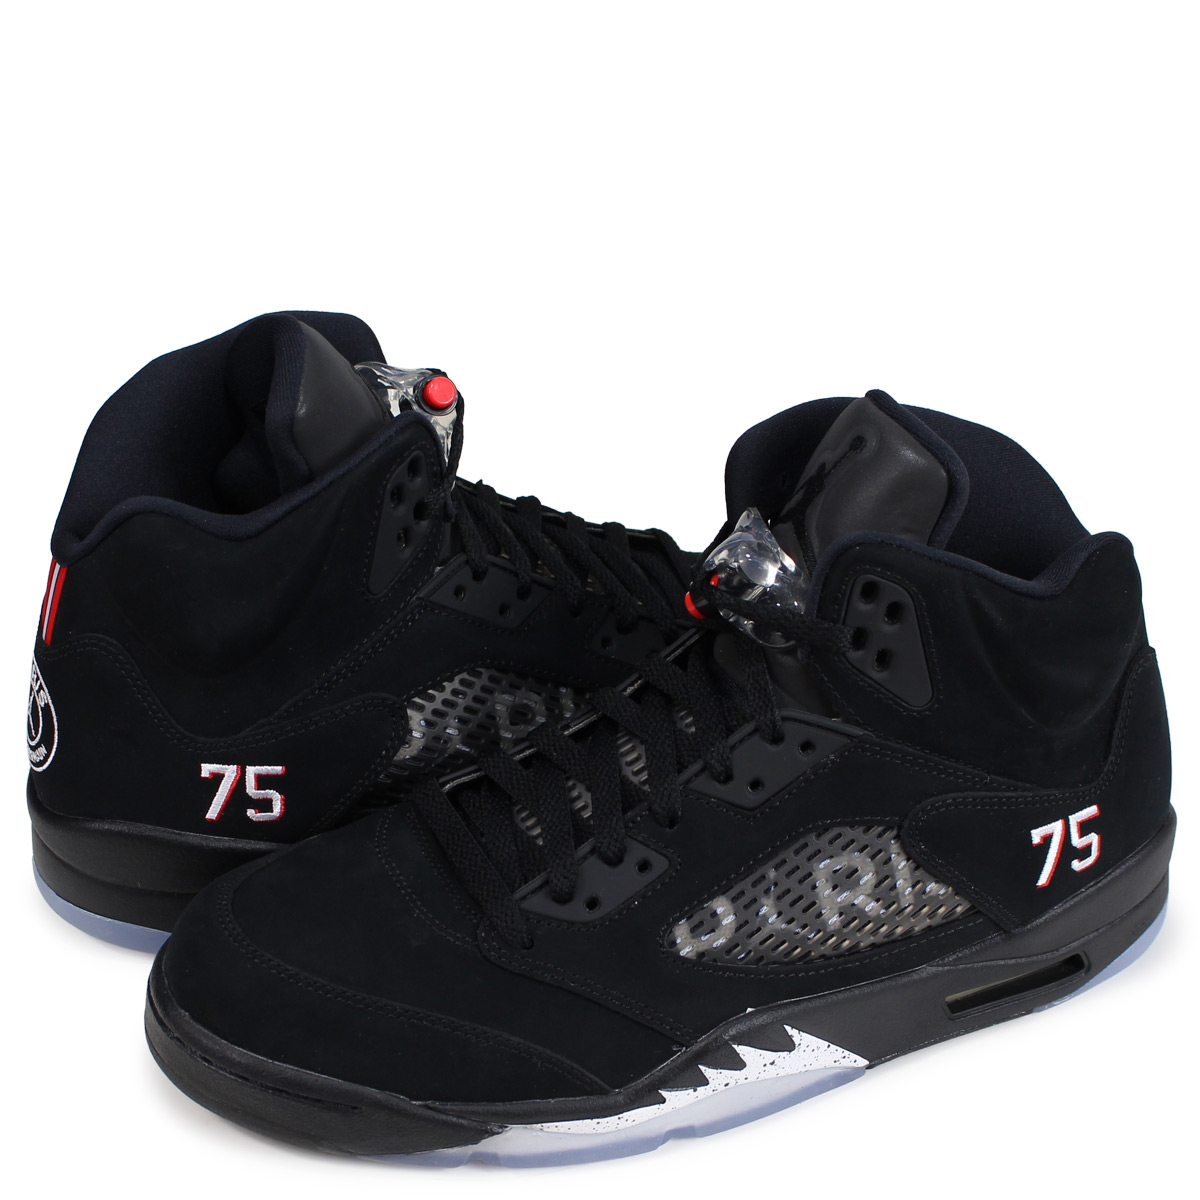 official photos 90934 f0c35 Nike NIKE Air Jordan 5 nostalgic sneakers men AIR JORDAN 5 RETRO BCFC PSG  black AV9175-001